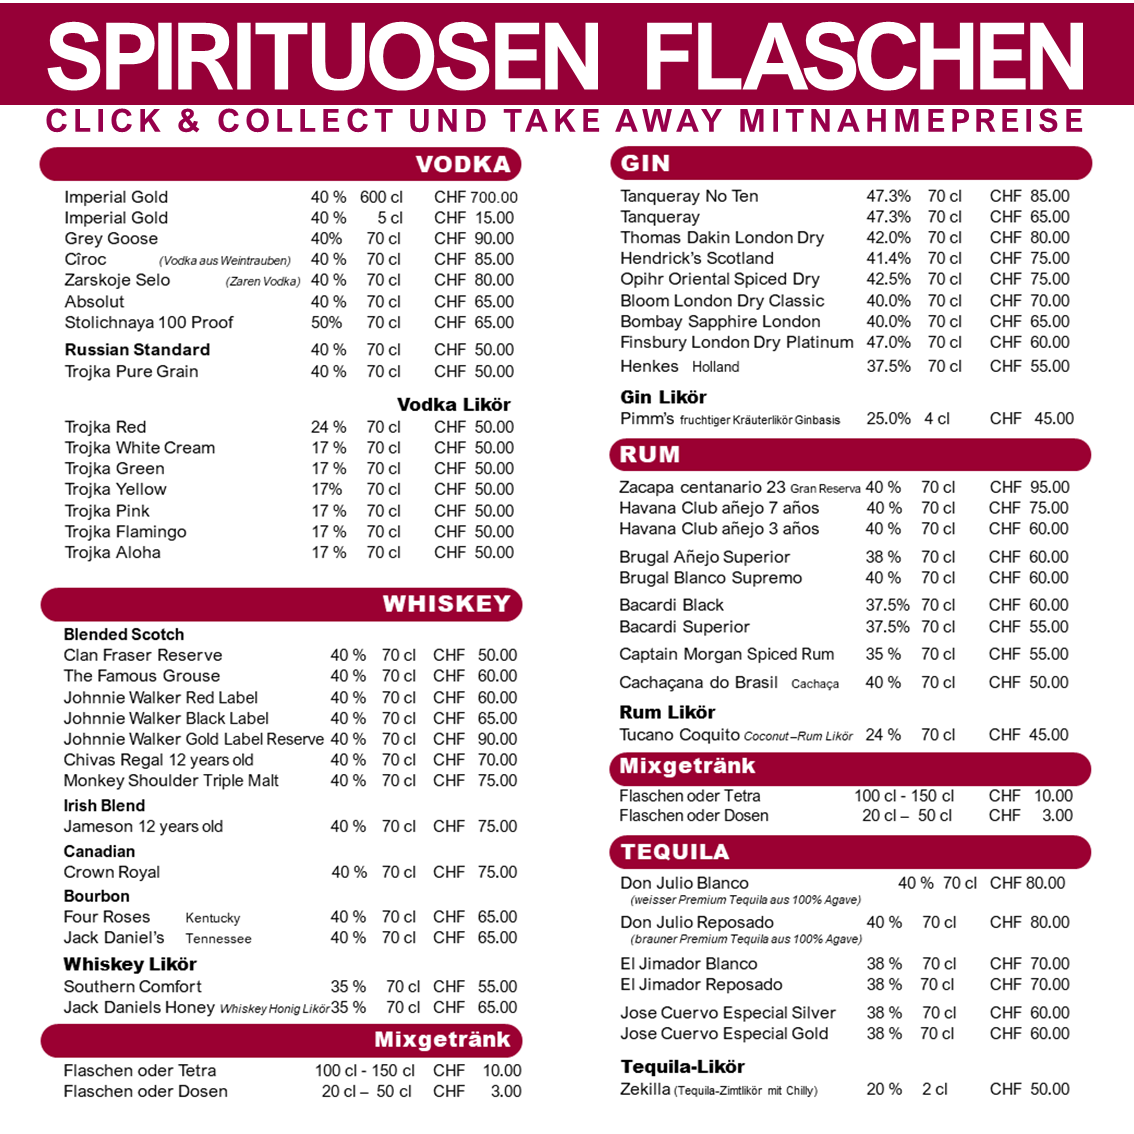 Click & Collect Spirituosen Flaschen Mitnahme-Preise